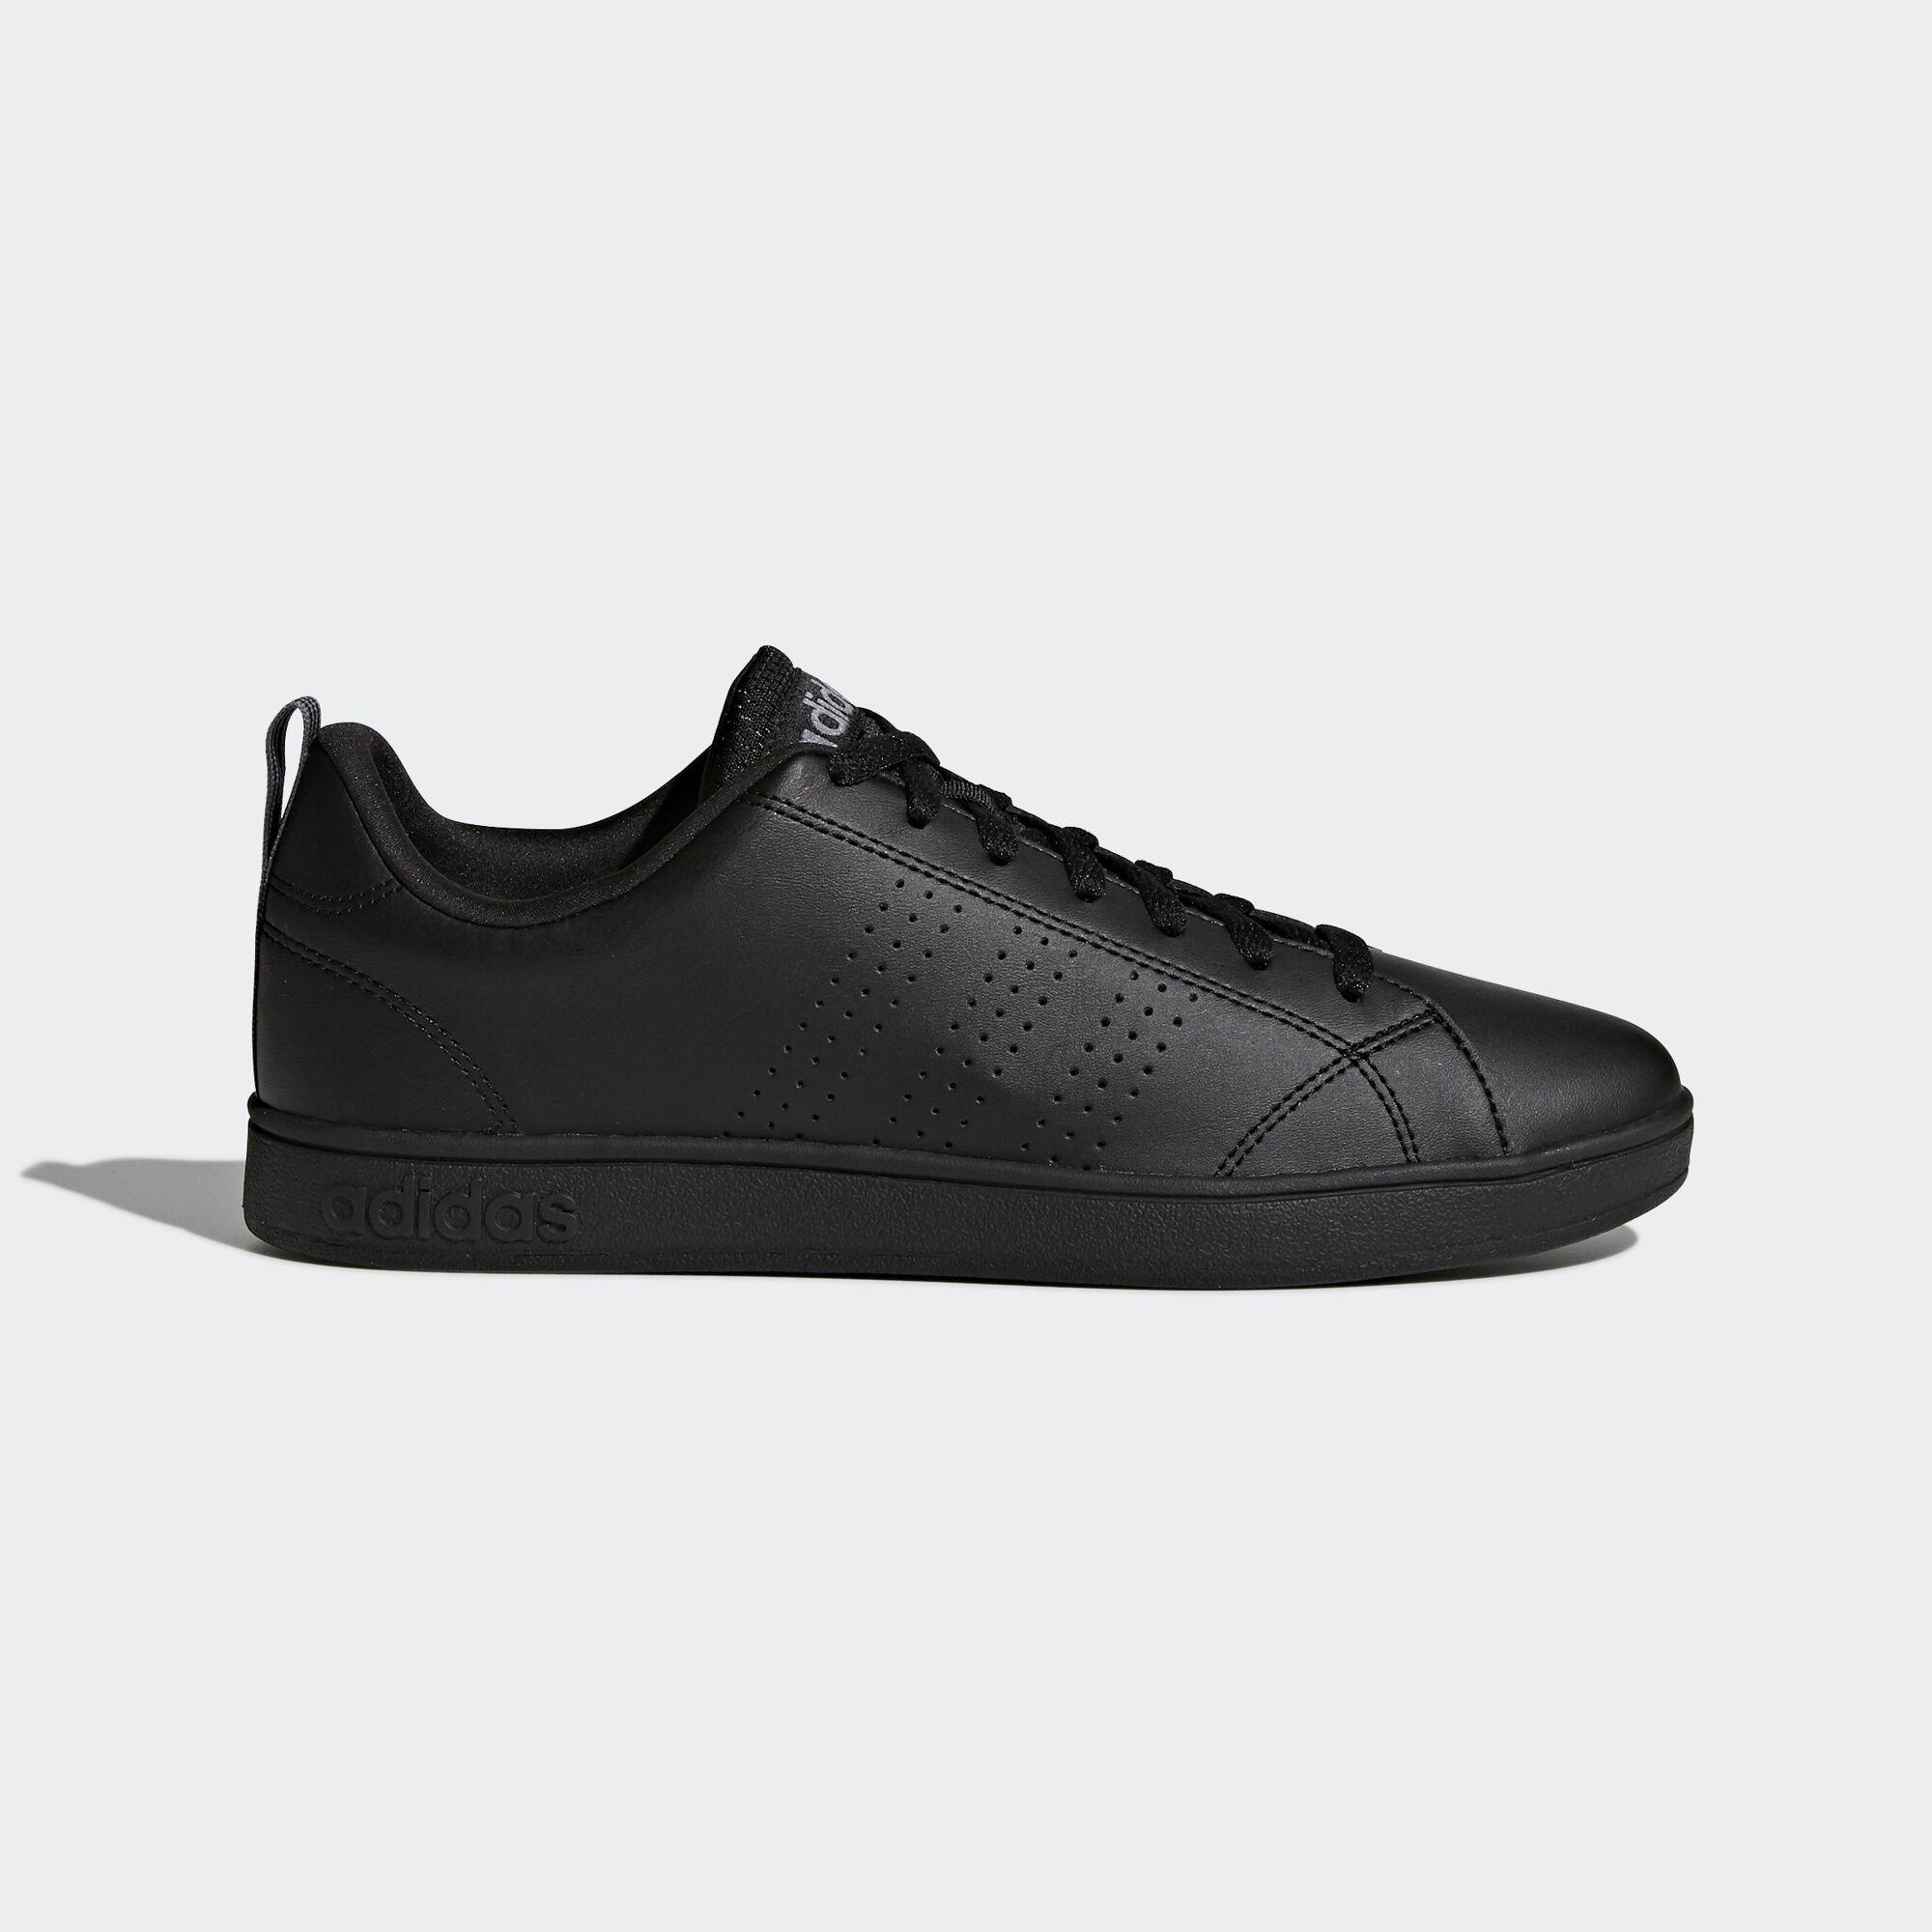 Adidas vs vantaggio le scarpe pulite nero adidas regionali